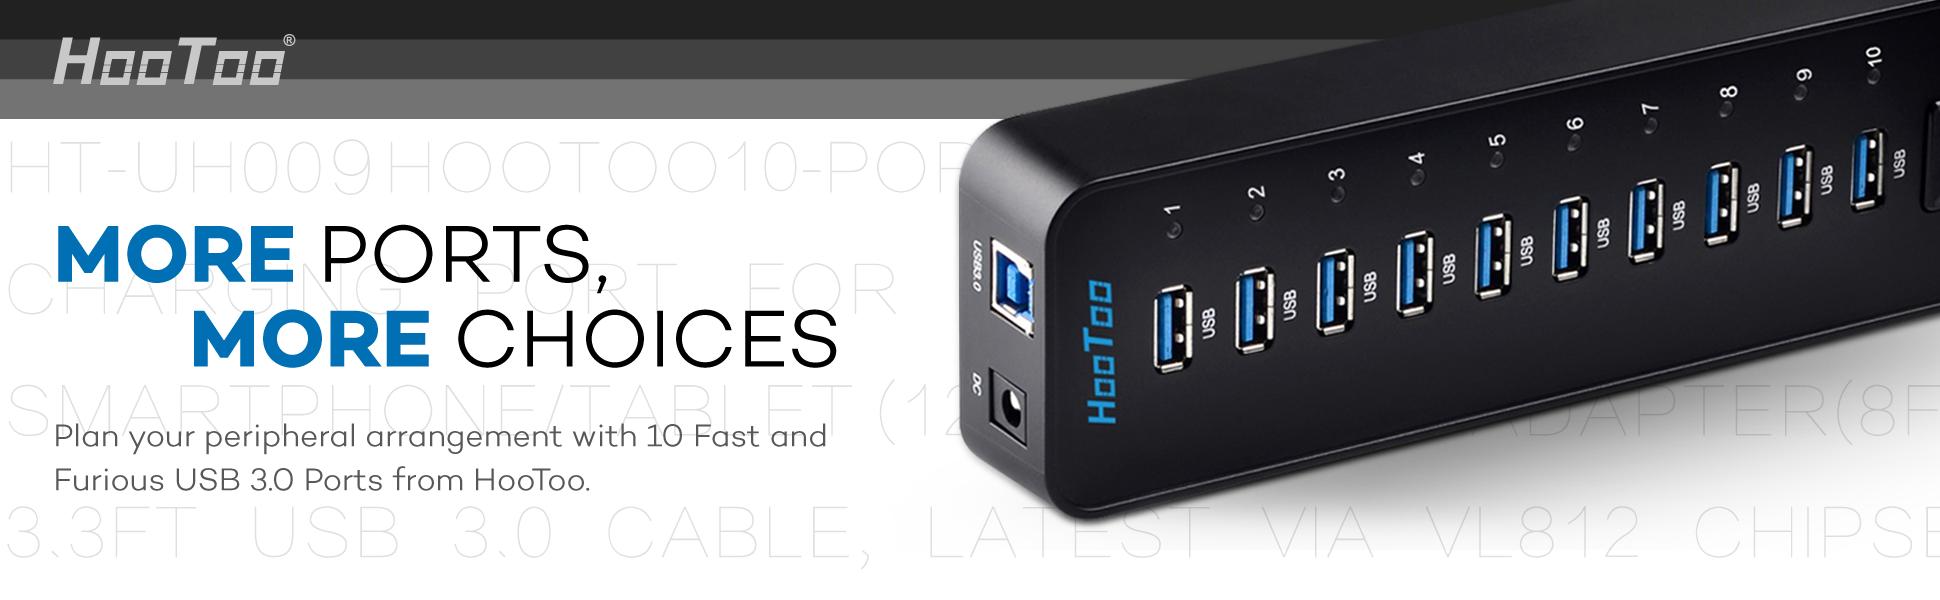 Amazon.com: HooToo USB 3.0 Hub 10-Port with 12V/4A Power ...